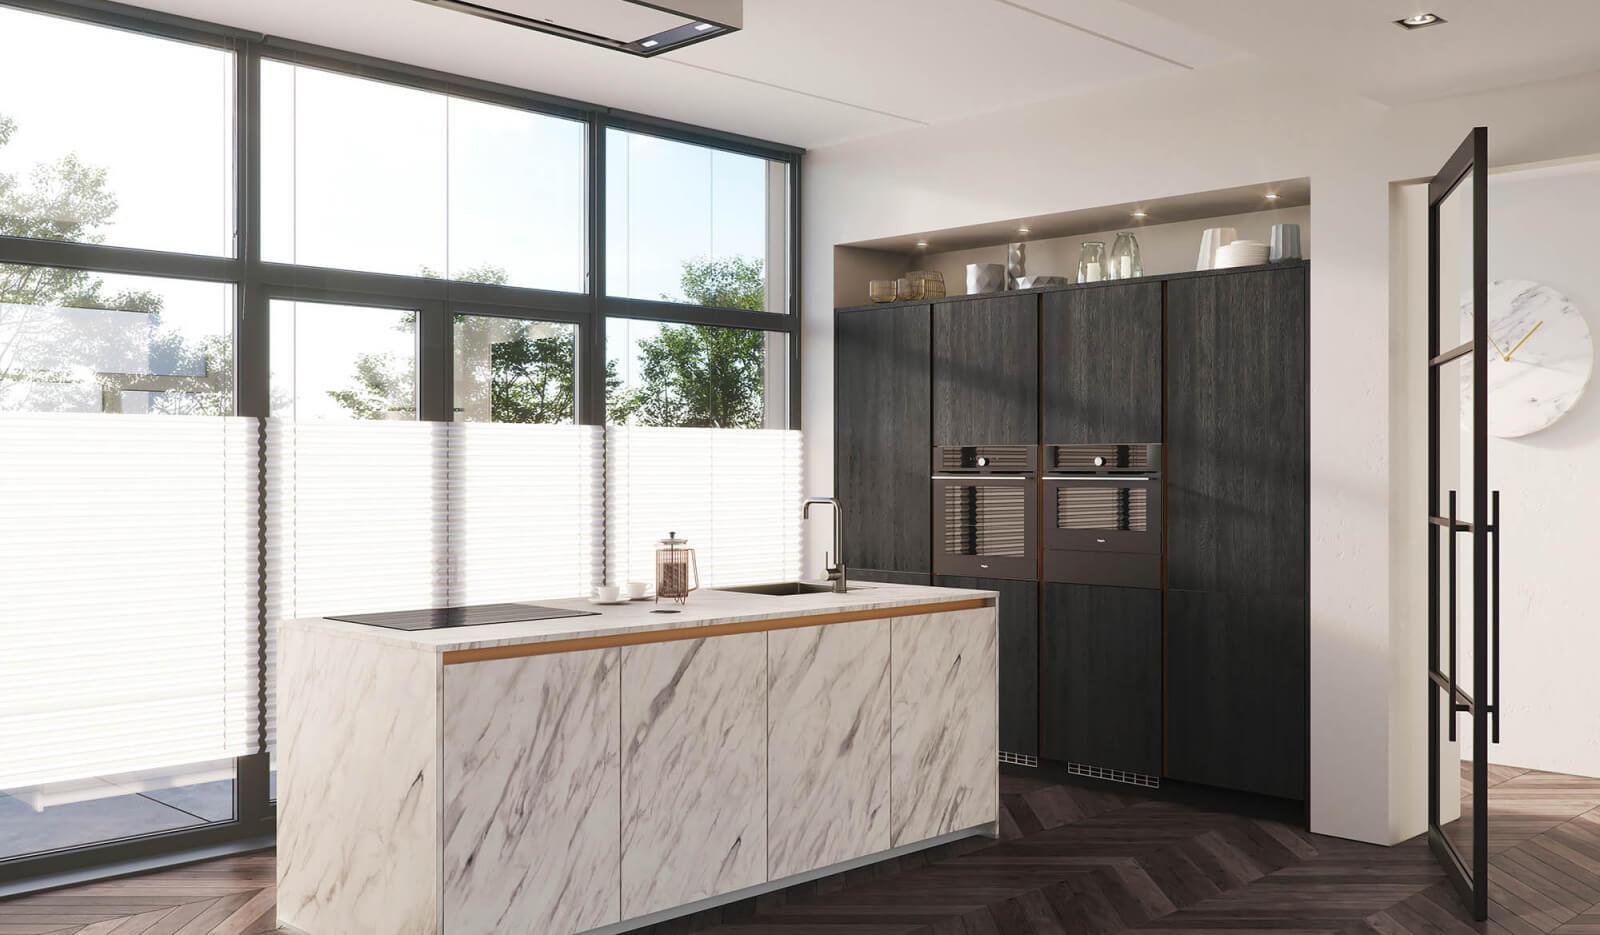 Keuken Atlas marmer & Jura eiken zwart - greeploze keuken